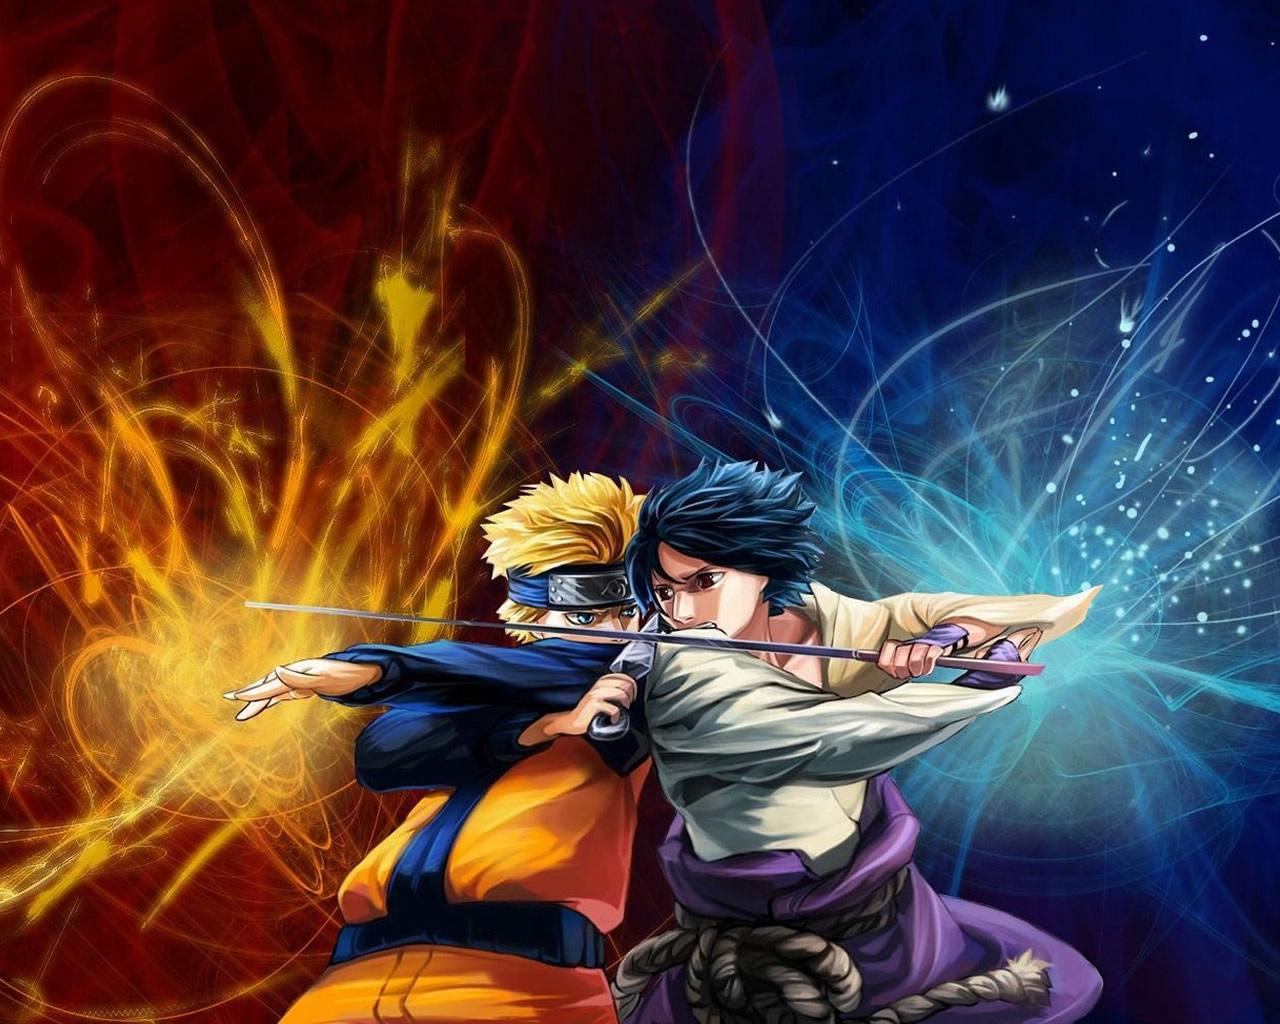 Epic Naruto Background